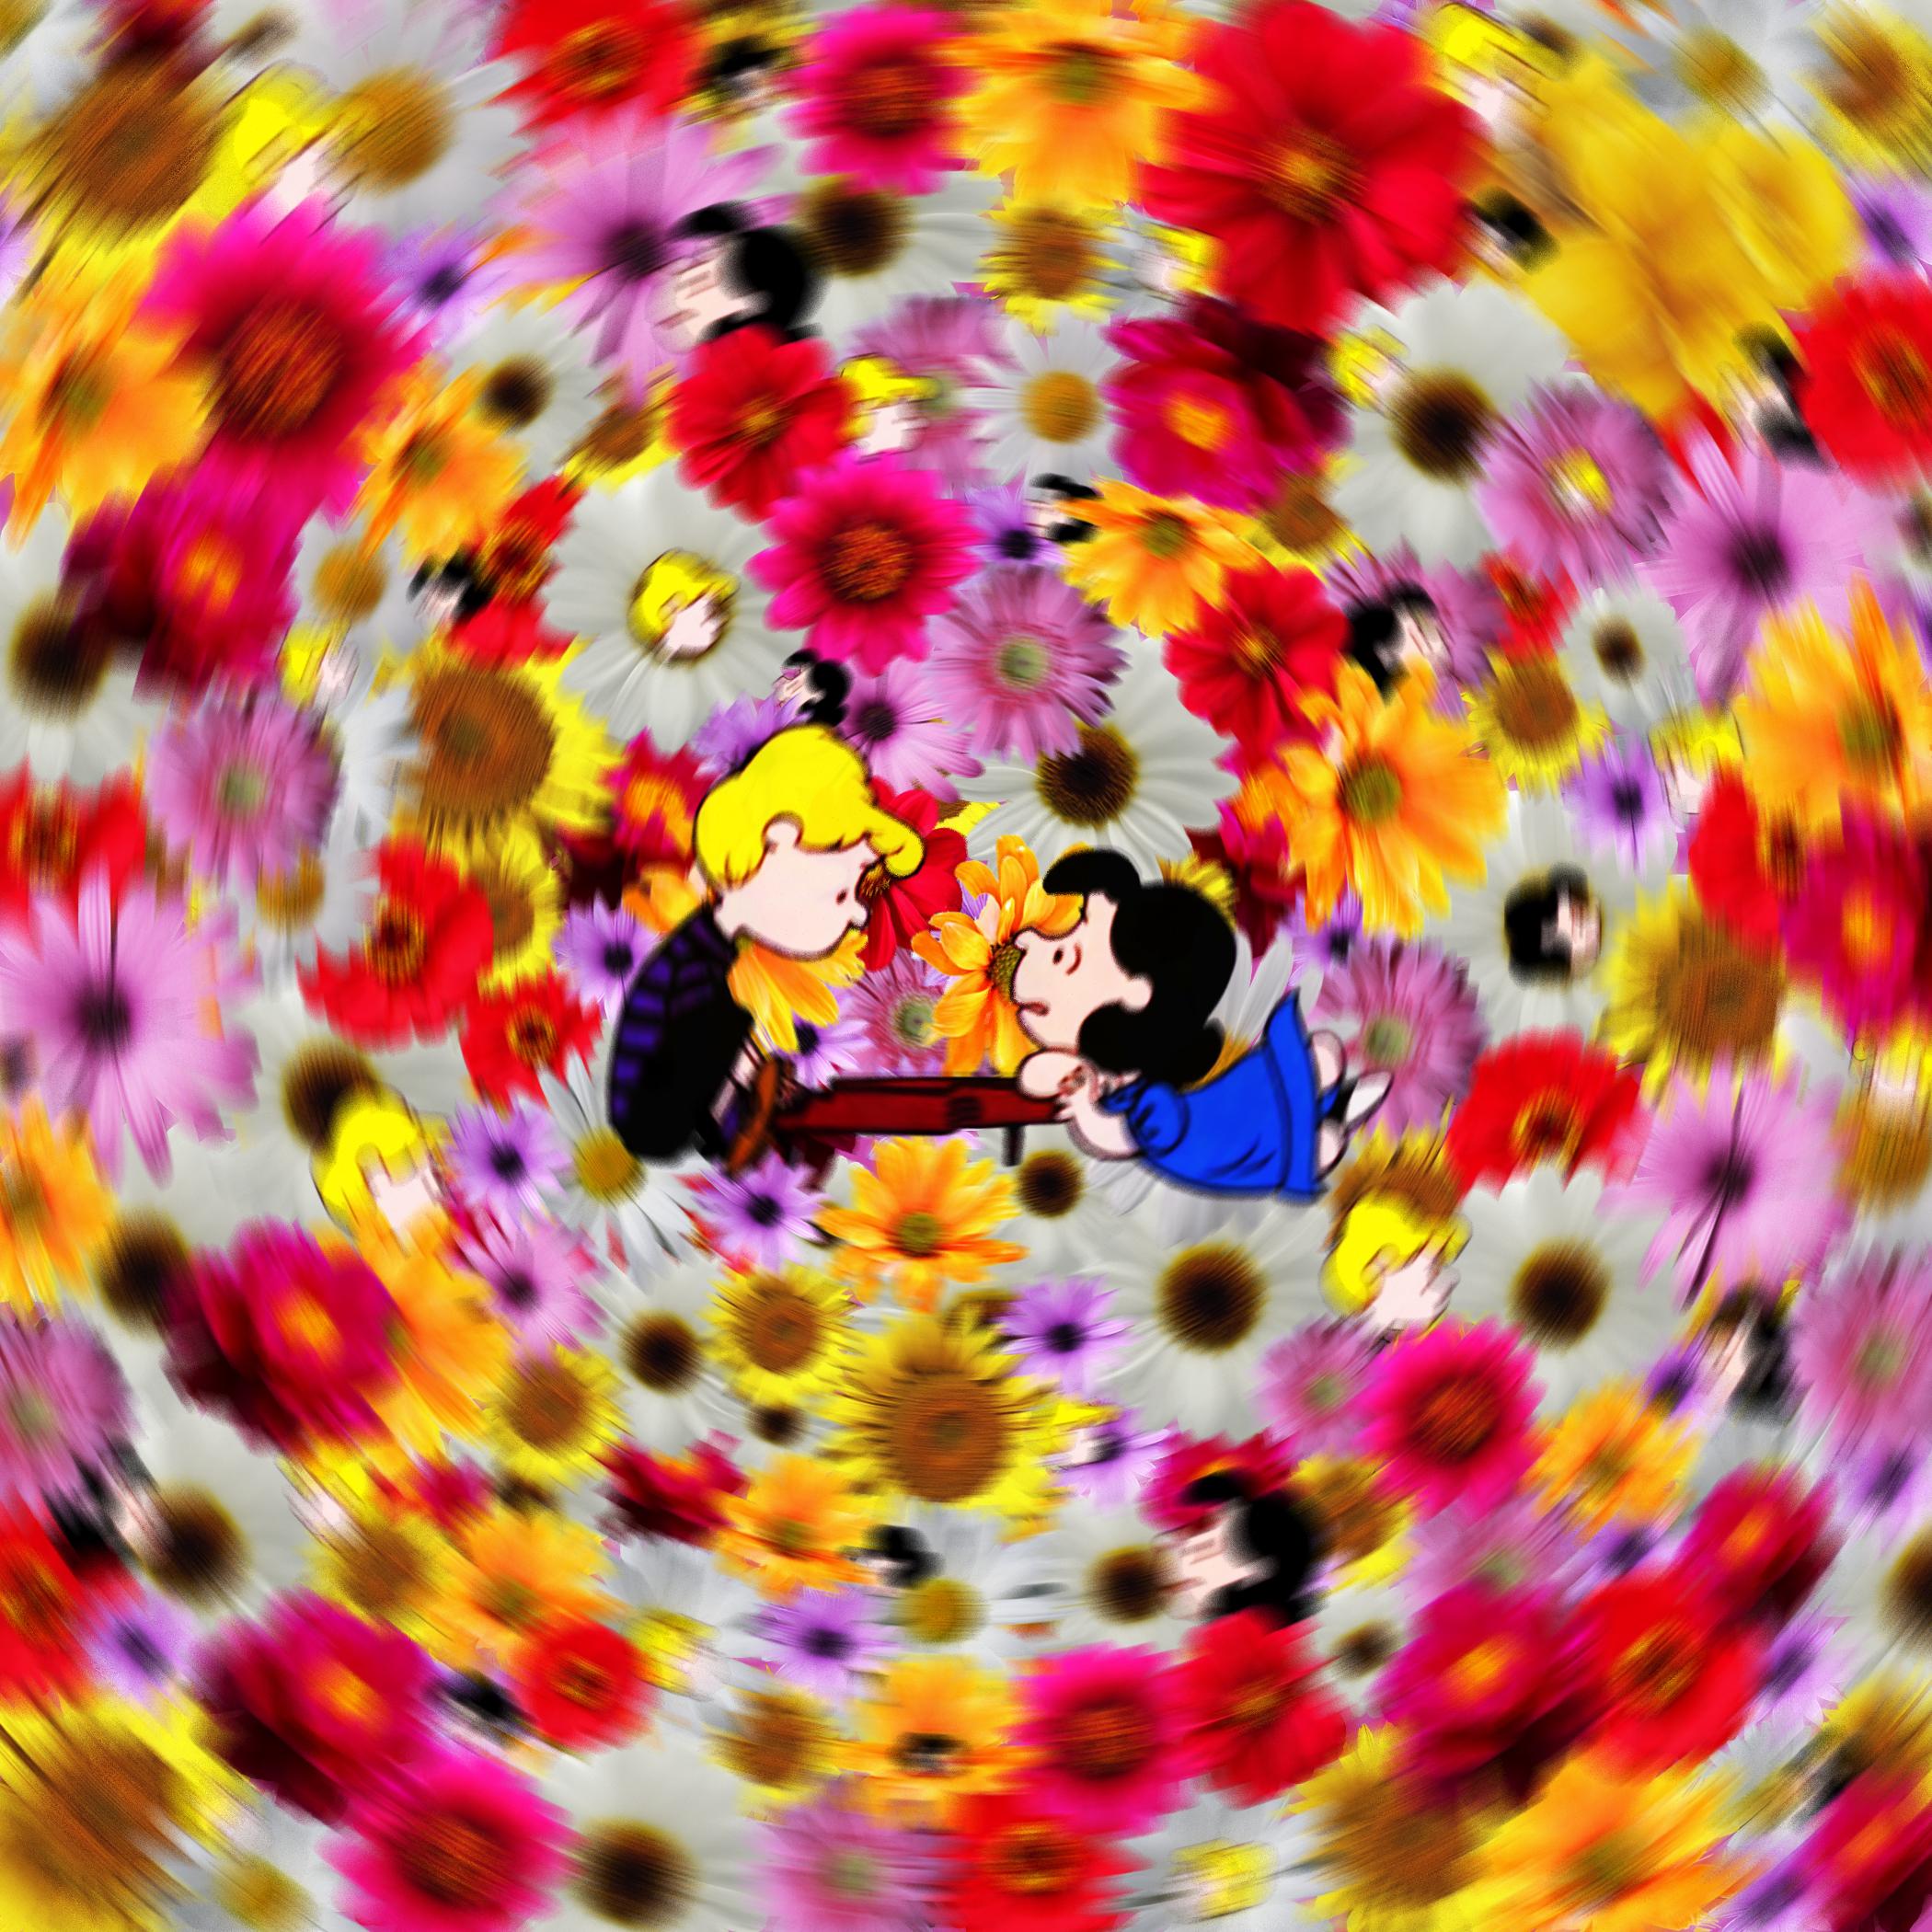 Linus & Lucy (Ikah Love Remix) - Vince Guaraldi Trio